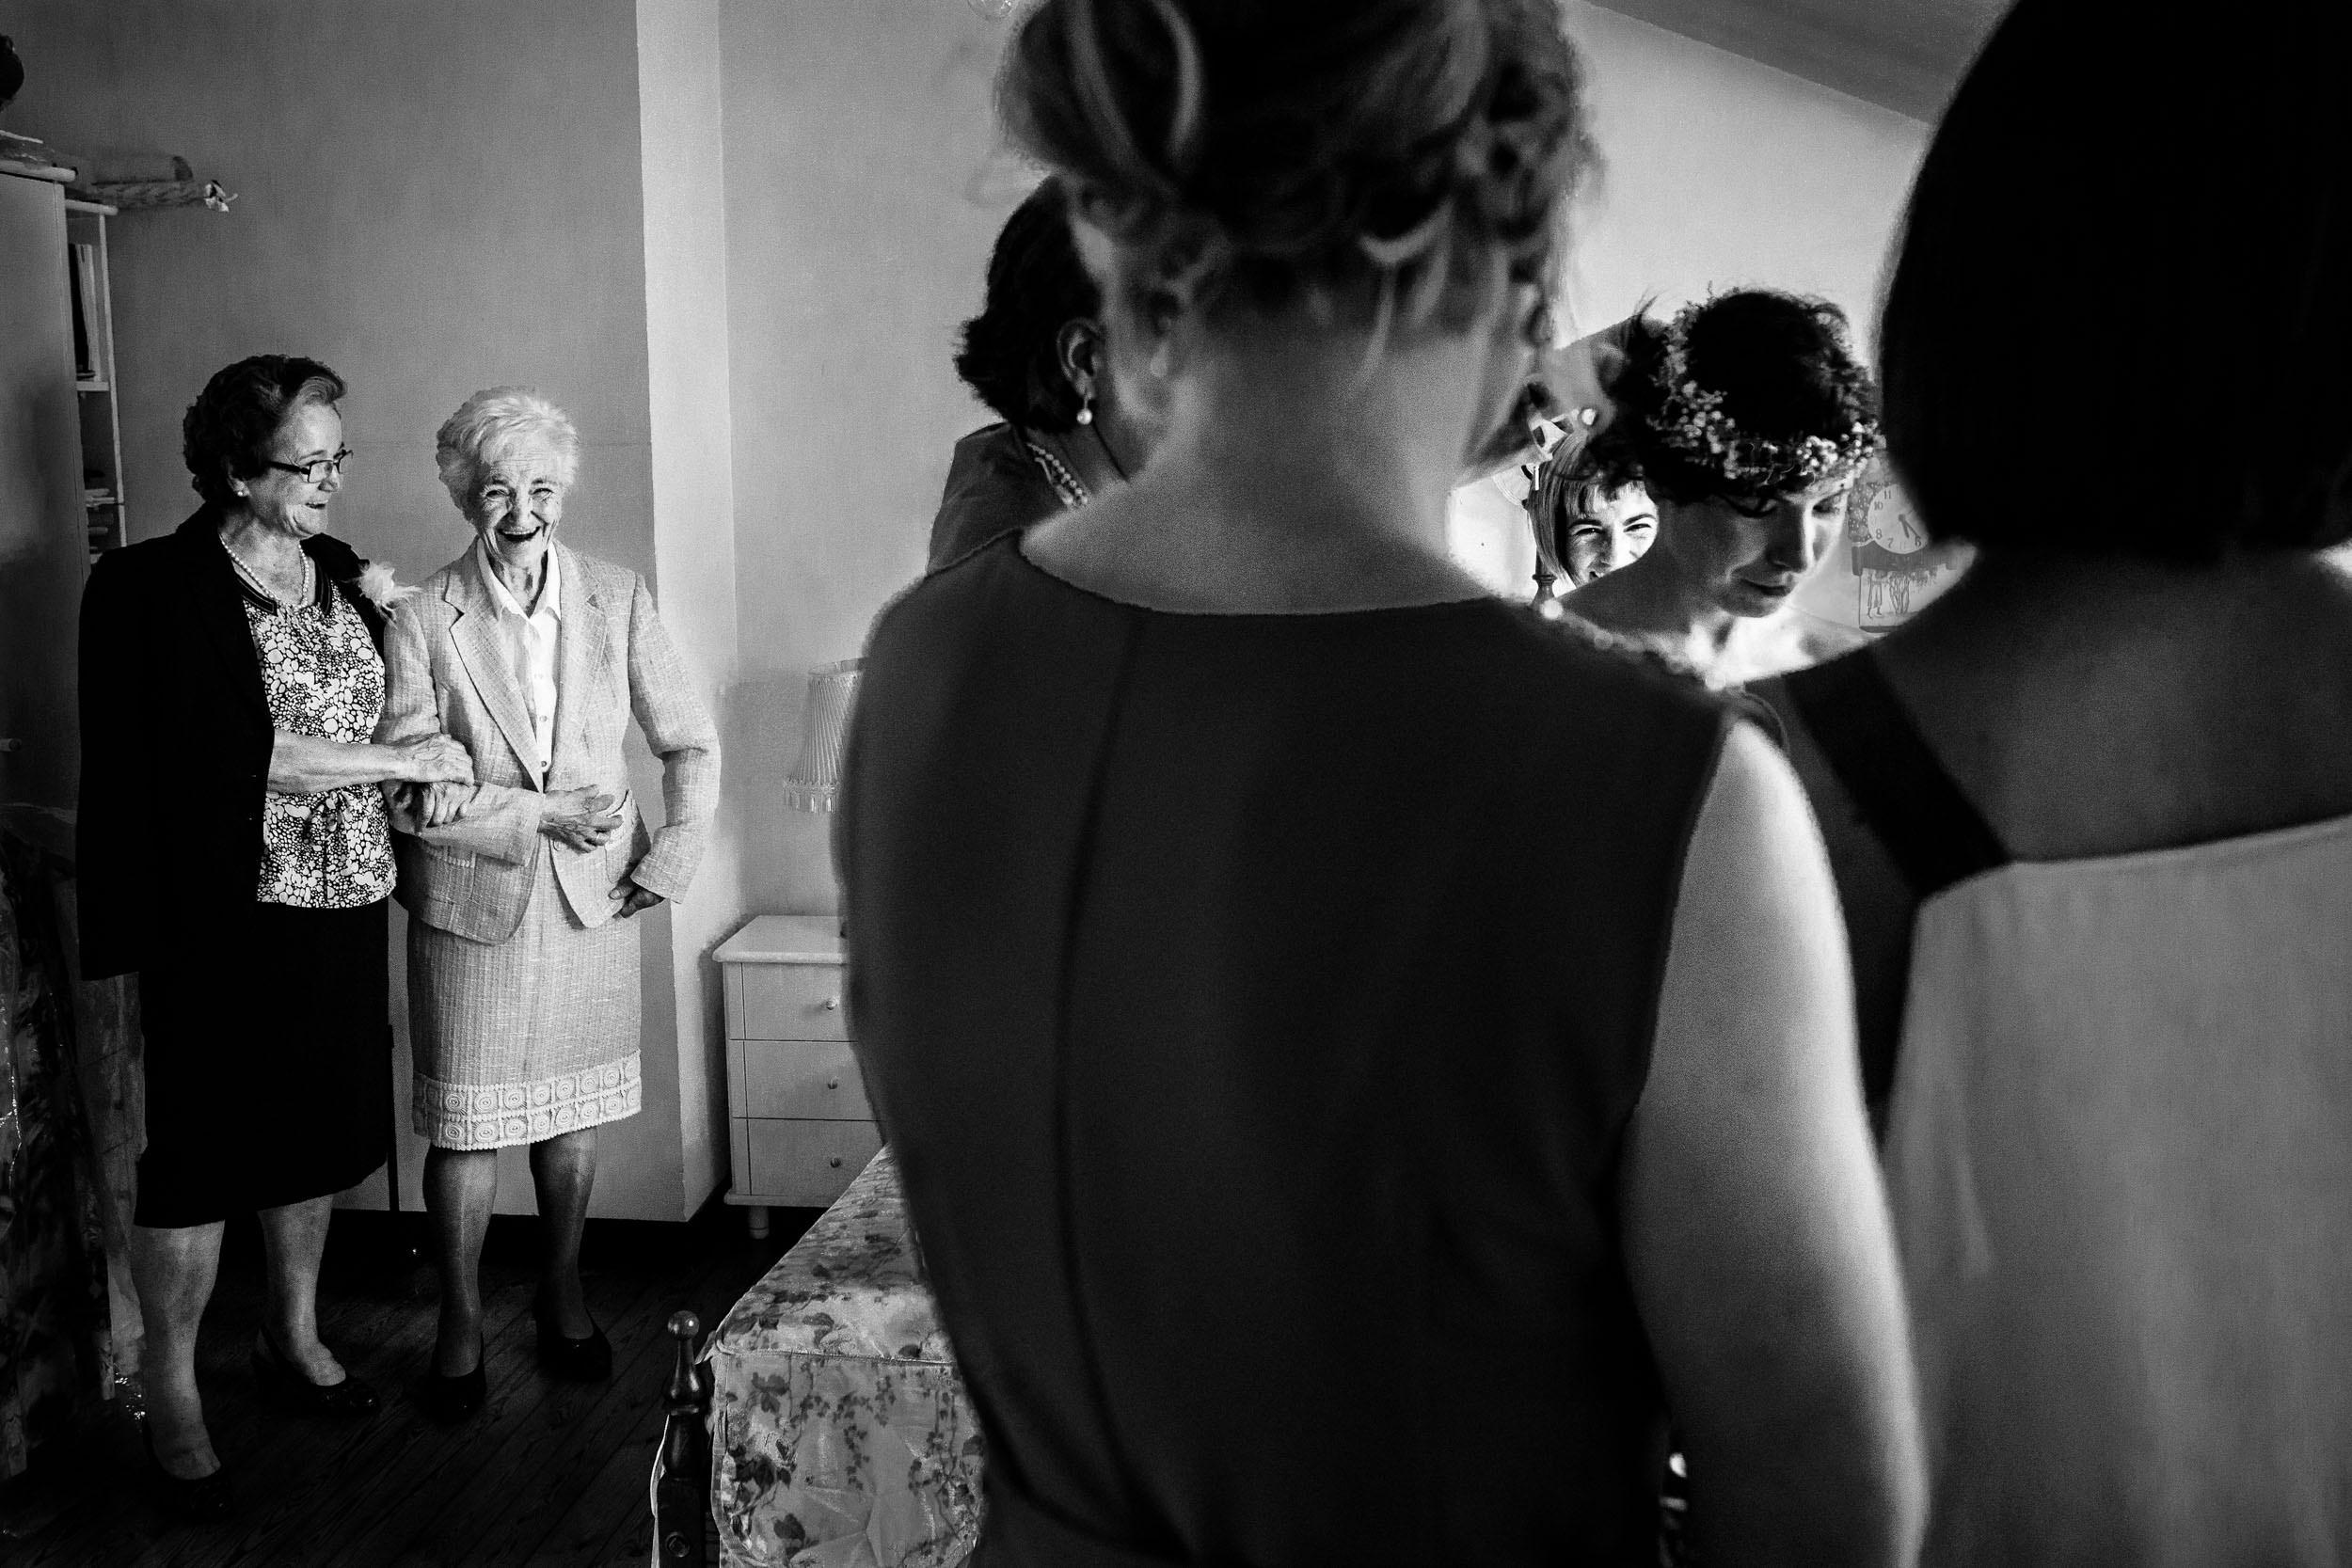 Best_Rioja_Wedding_Photography_Sturcke_004.jpg